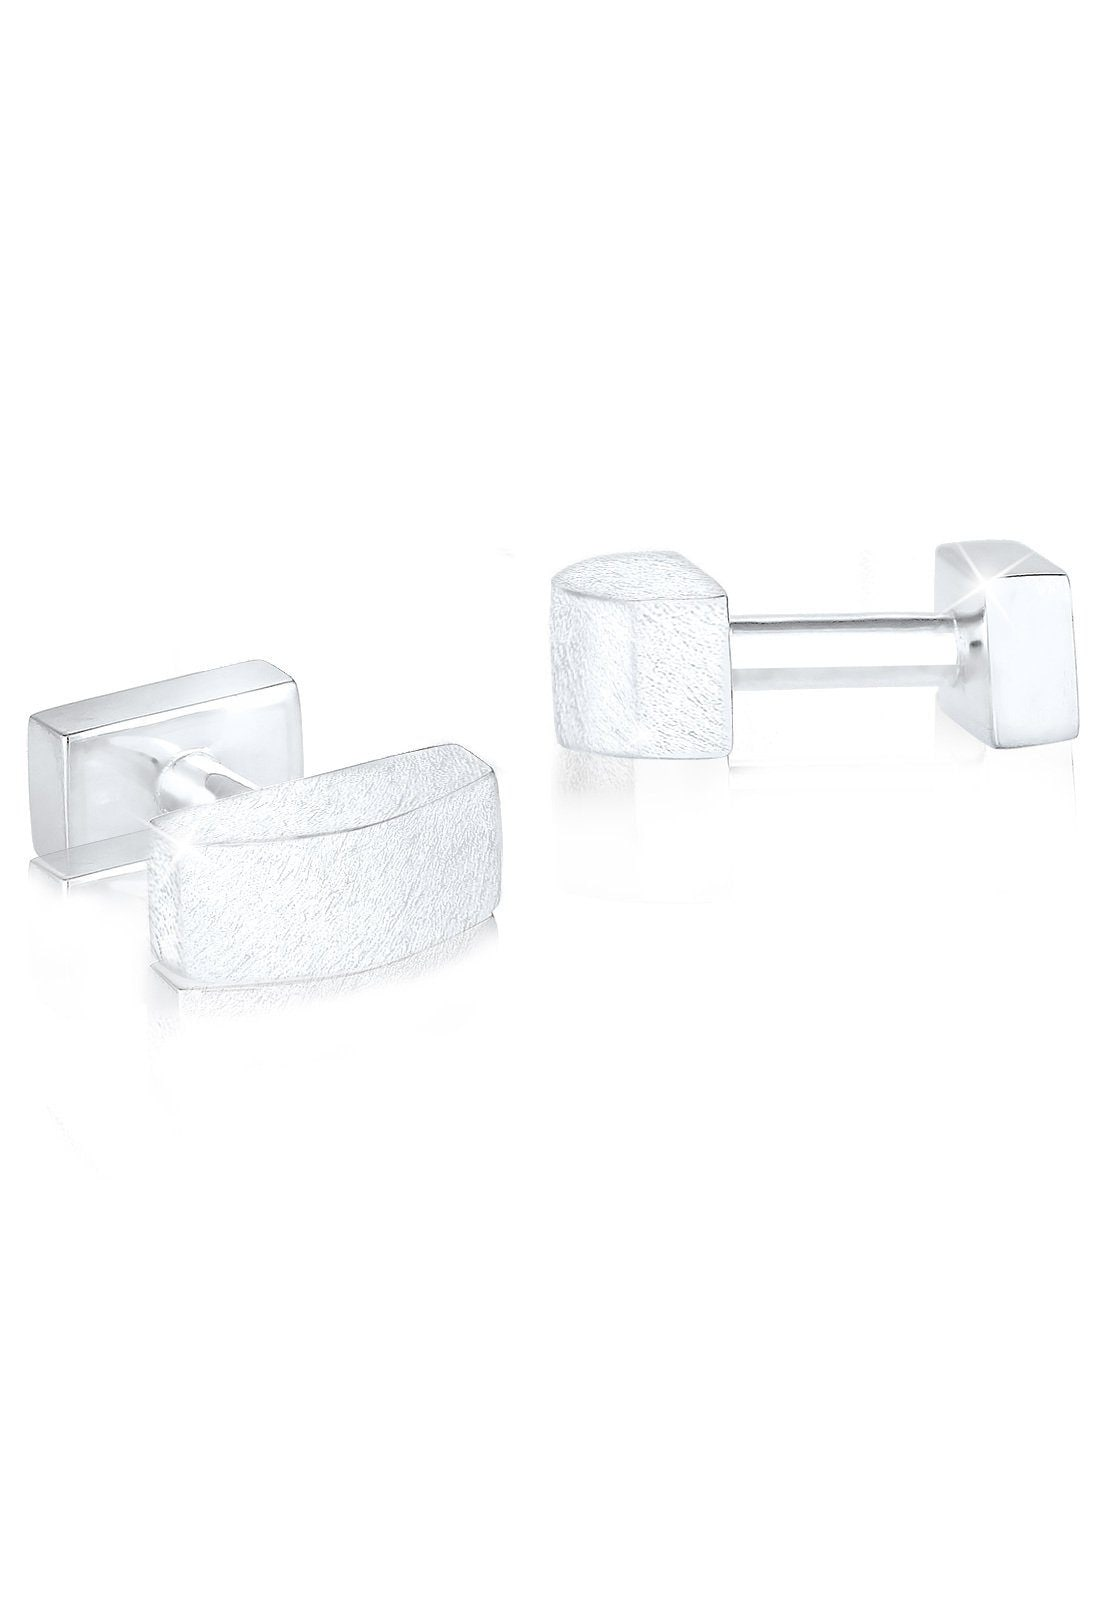 Paulo Fanello Manschettenknöpfe Rechteck Geo Basic Brushed 925 Sterling Silber | Accessoires > Manschettenknöpfe | Paulo Fanello